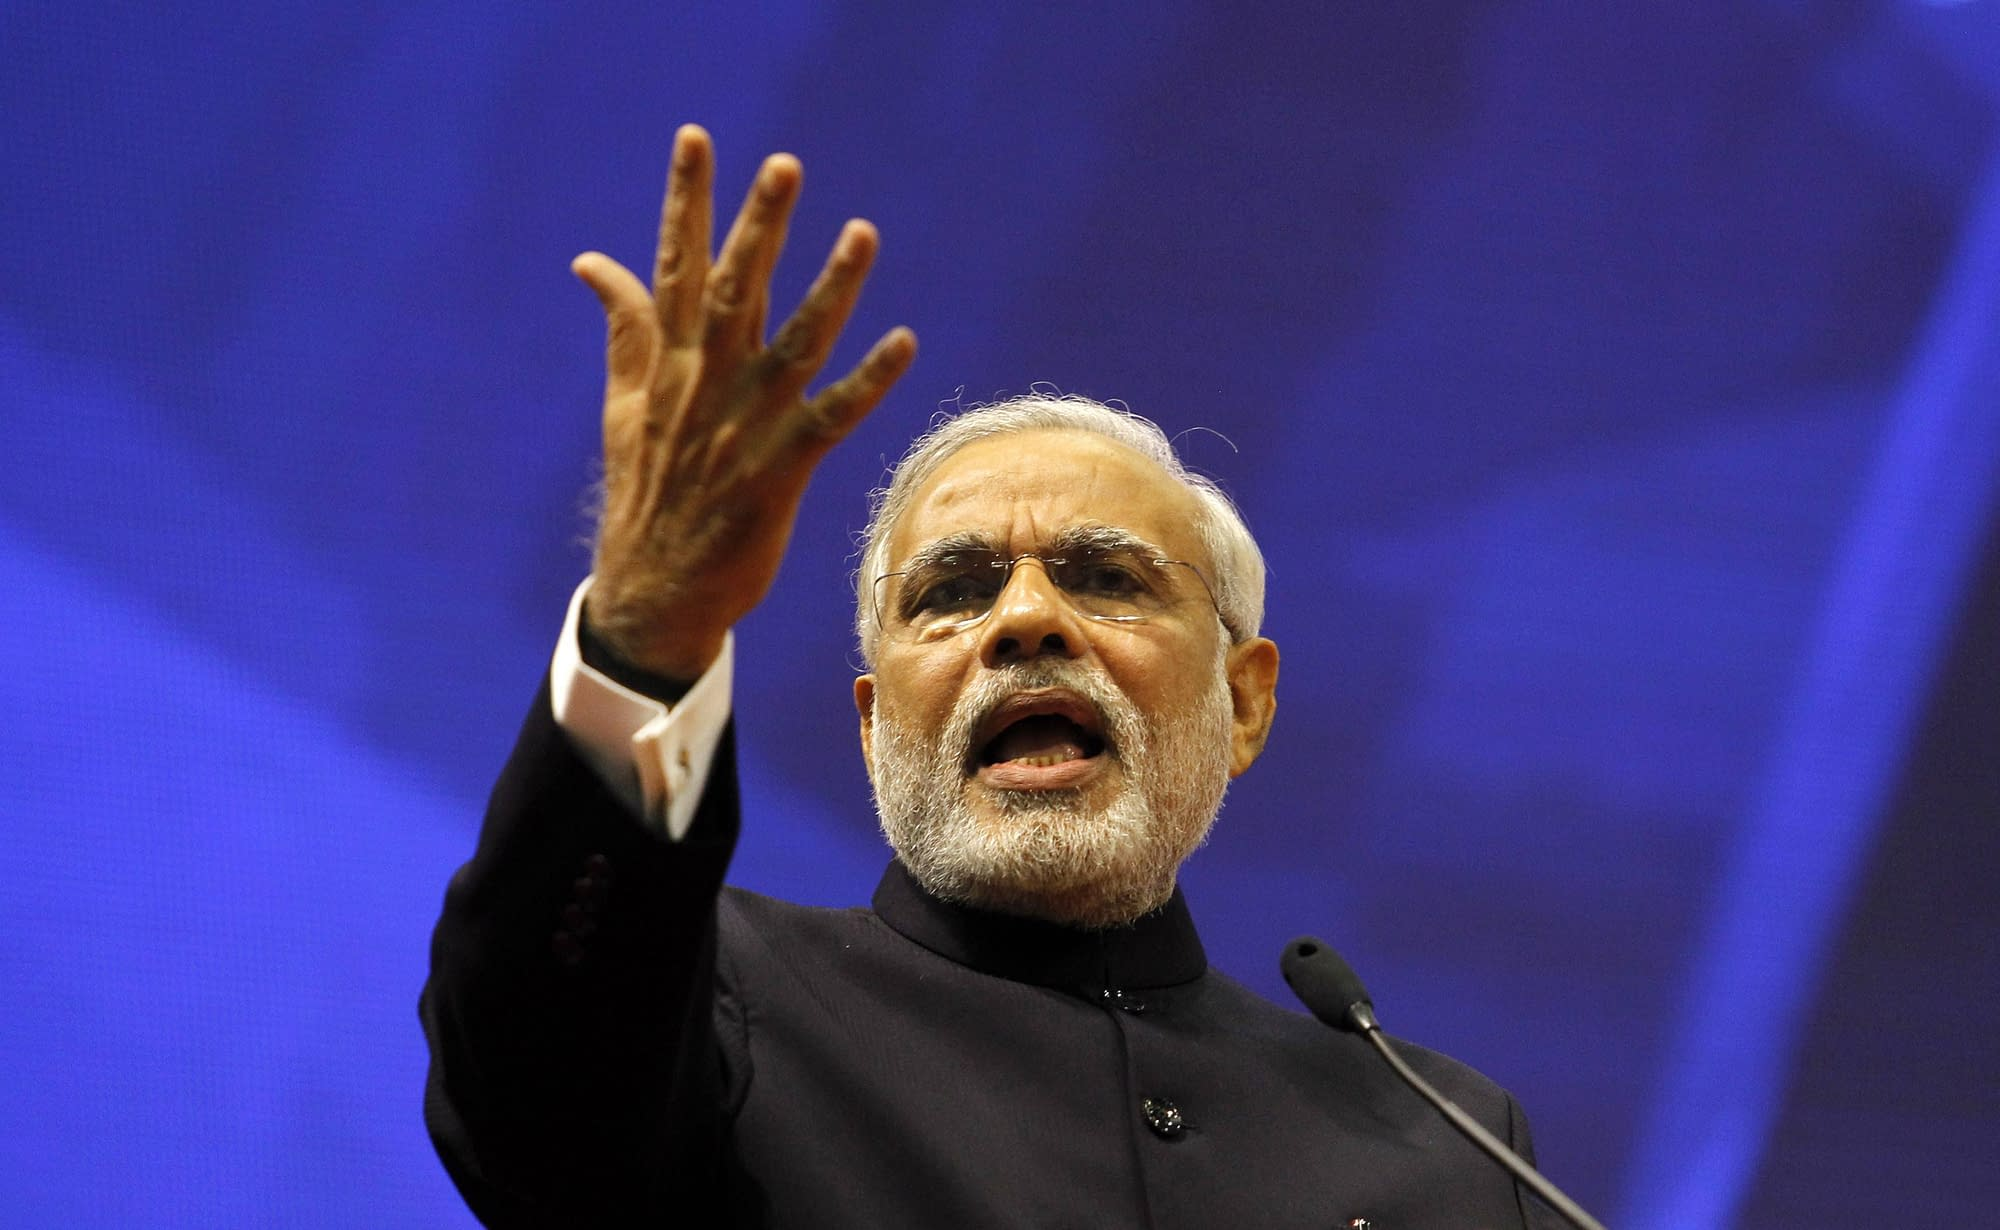 Gujarat's CM Modi speaks during Vibrant Gujarat Summit at Gandhinagar